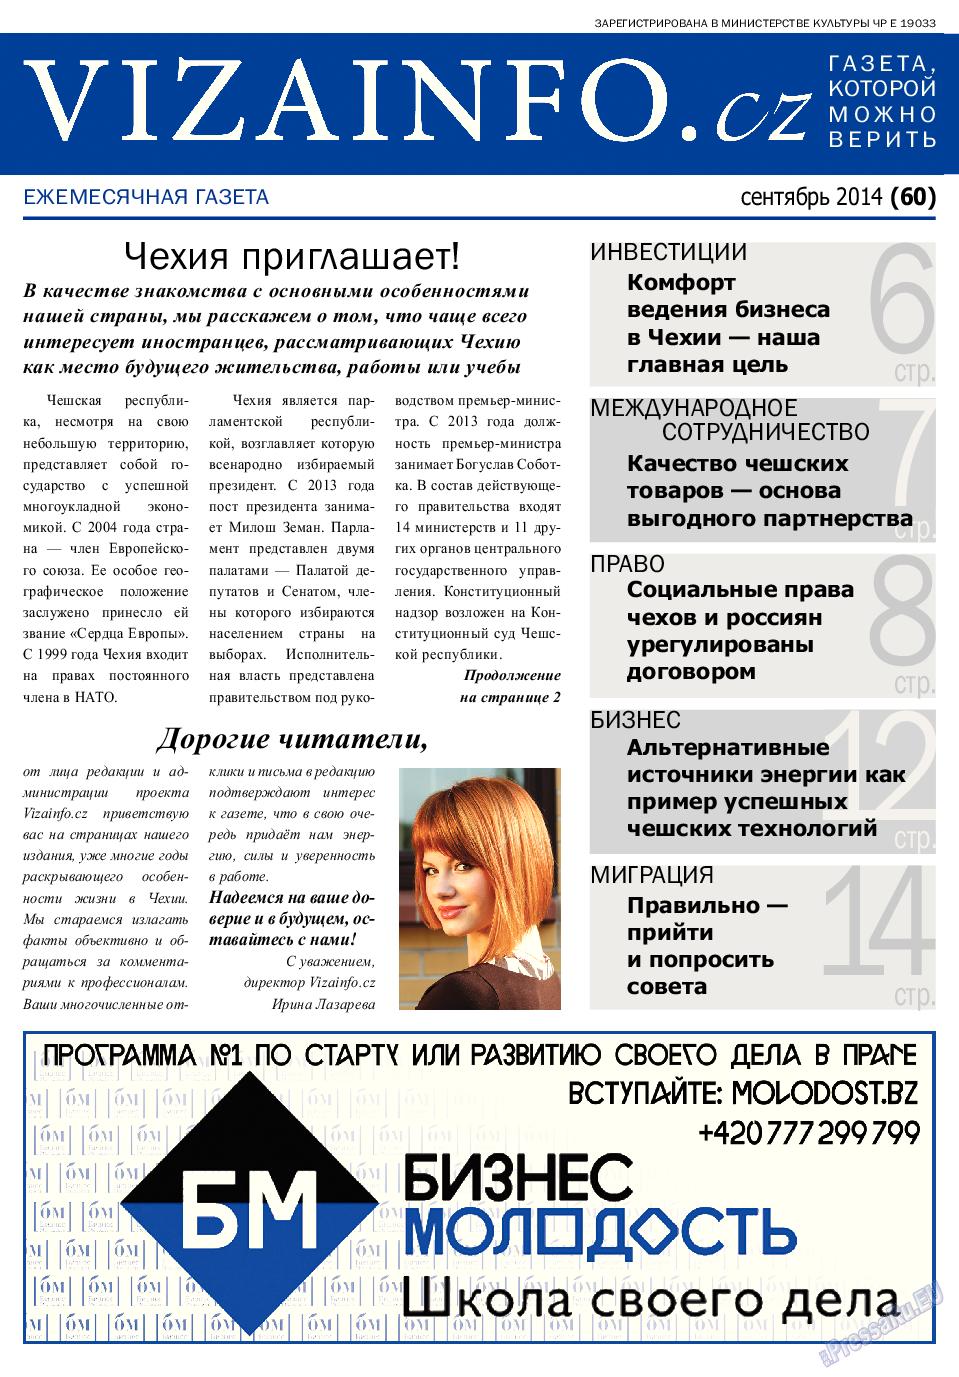 Vizainfo.cz (газета). 2014 год, номер 60, стр. 1